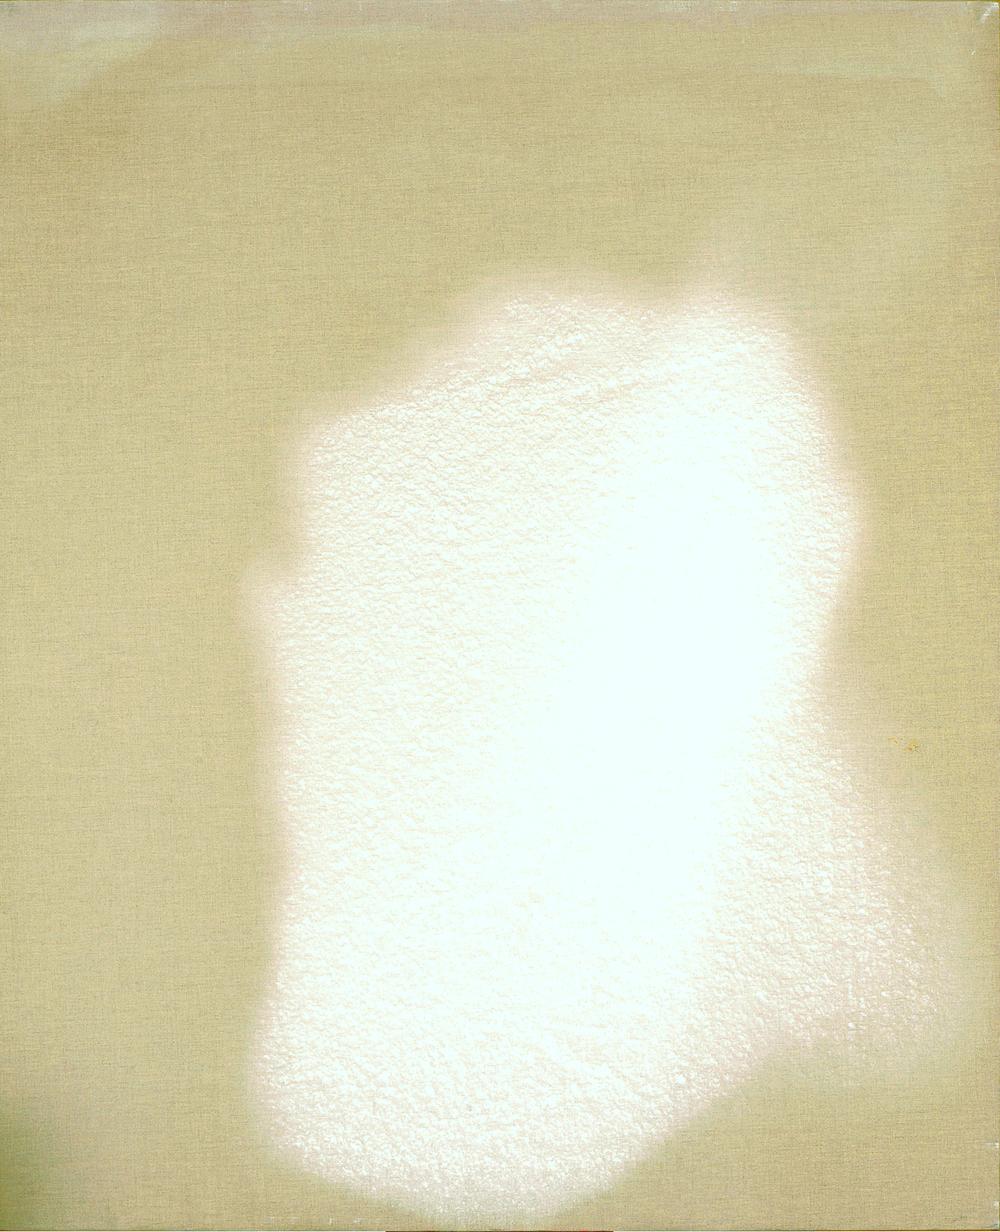 29 aprile, 2011, olio su tela, cm 110 x 90  29 aprile, 2011, oil on canvas, cm 110 x 90